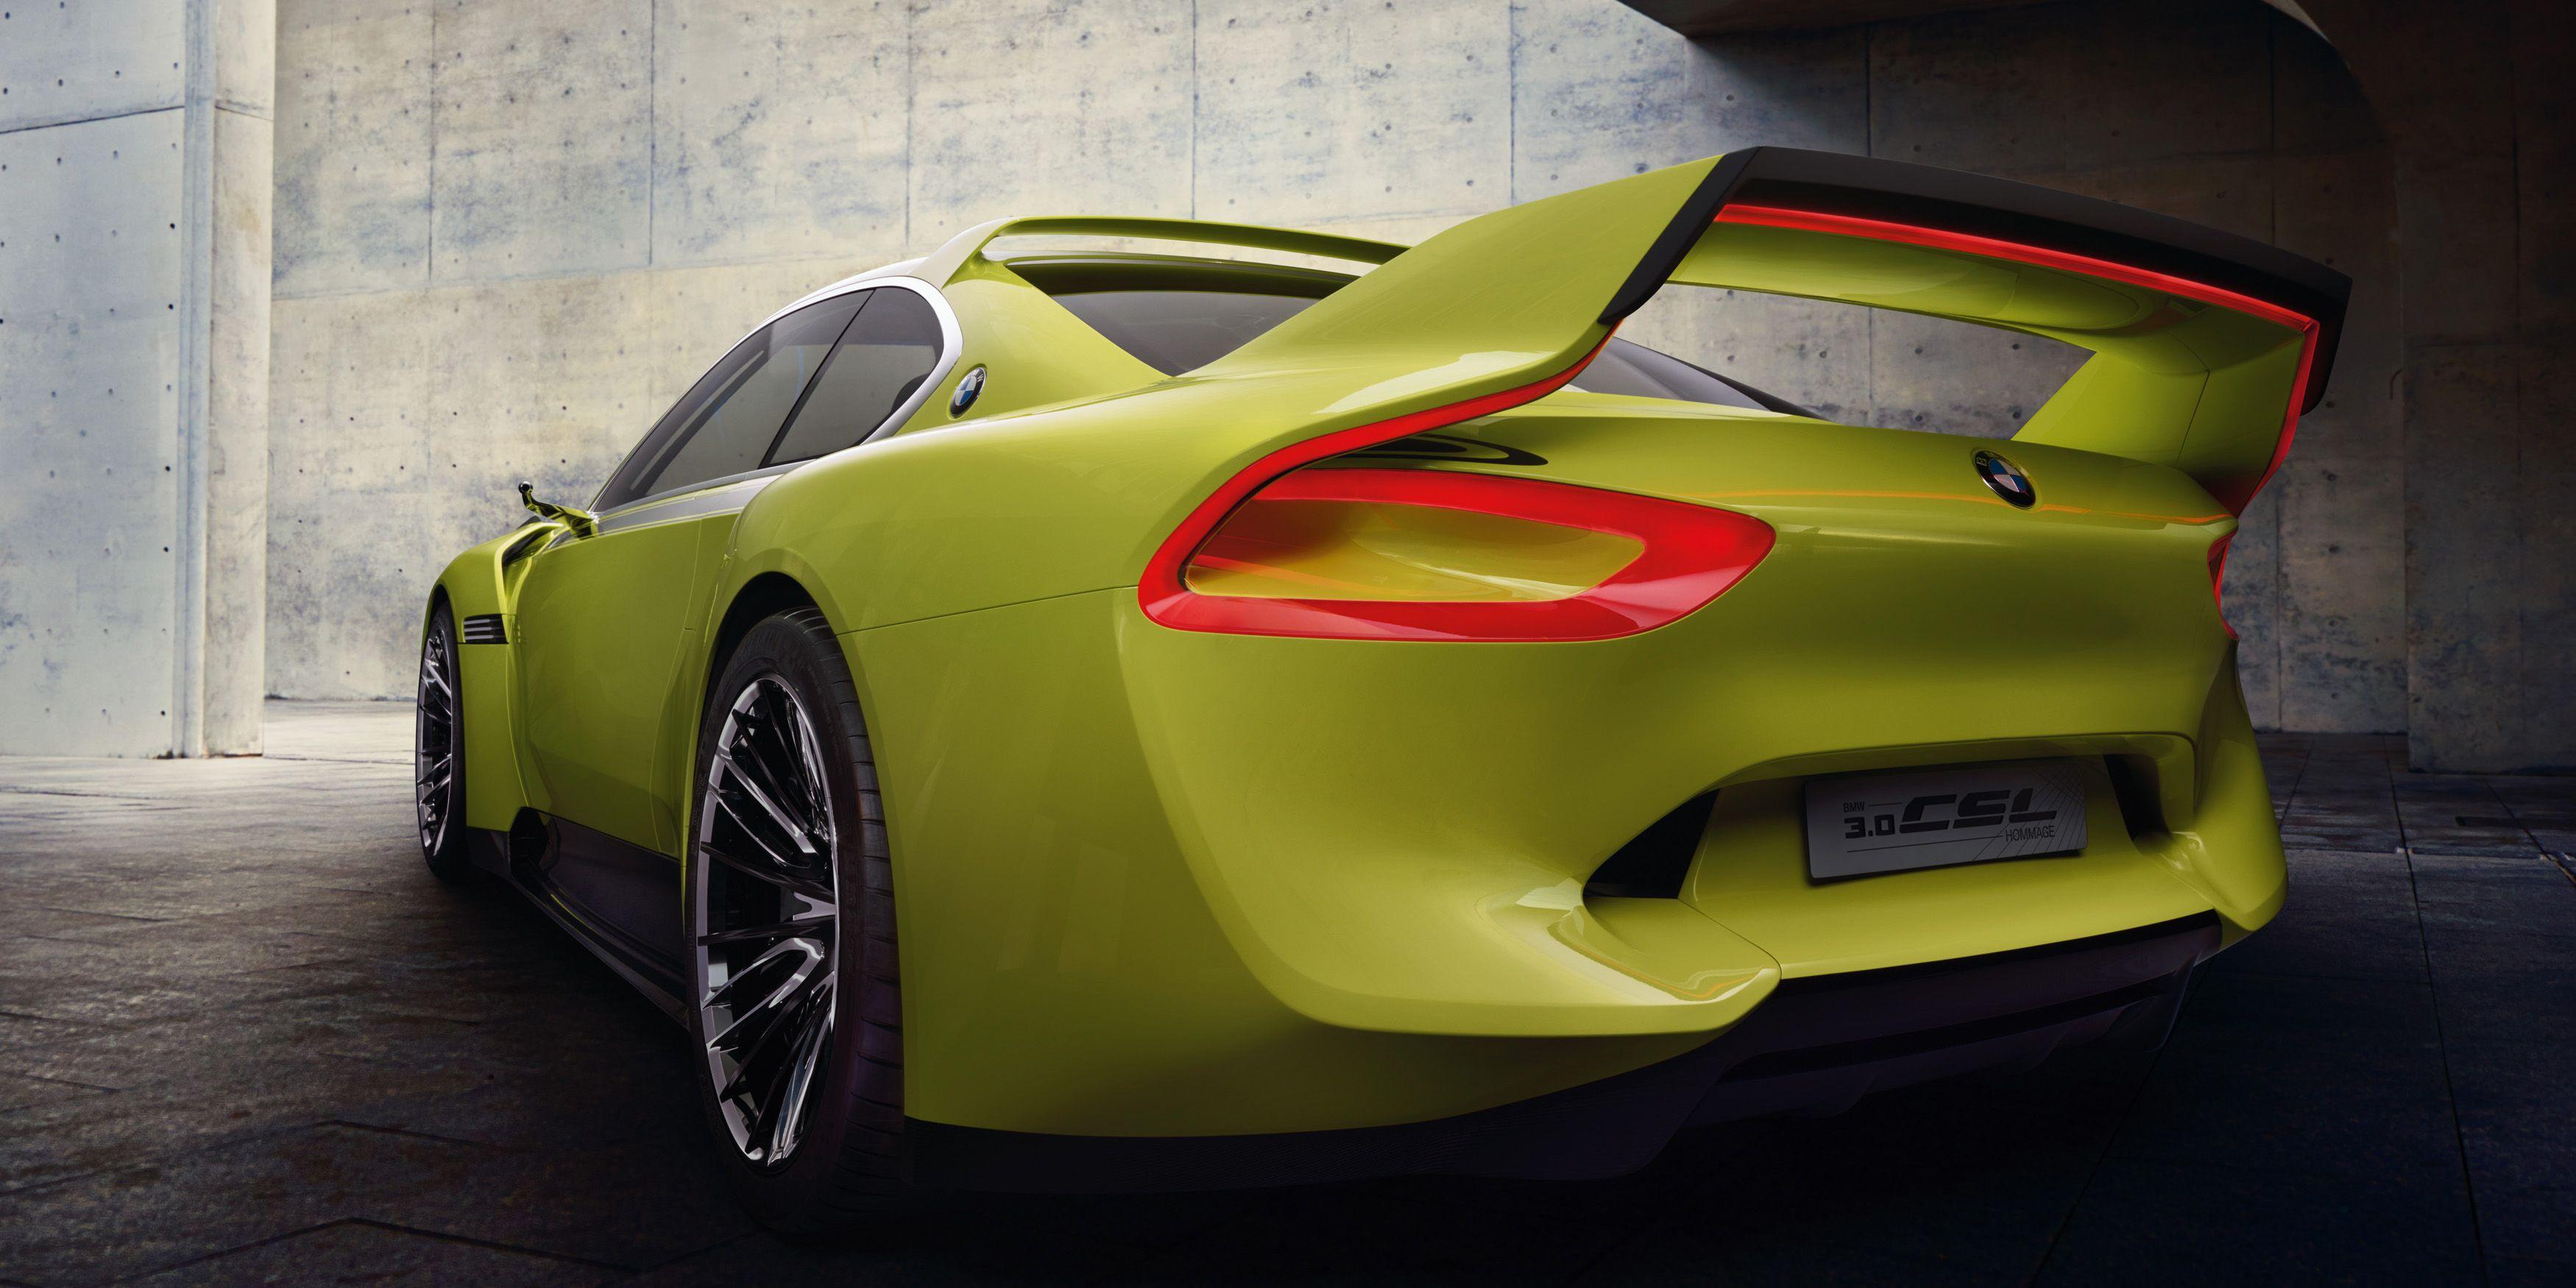 Bmw 3 0 Csl Hommage Concept Official Photos Concept Cars Bmw Hybrid Bmw